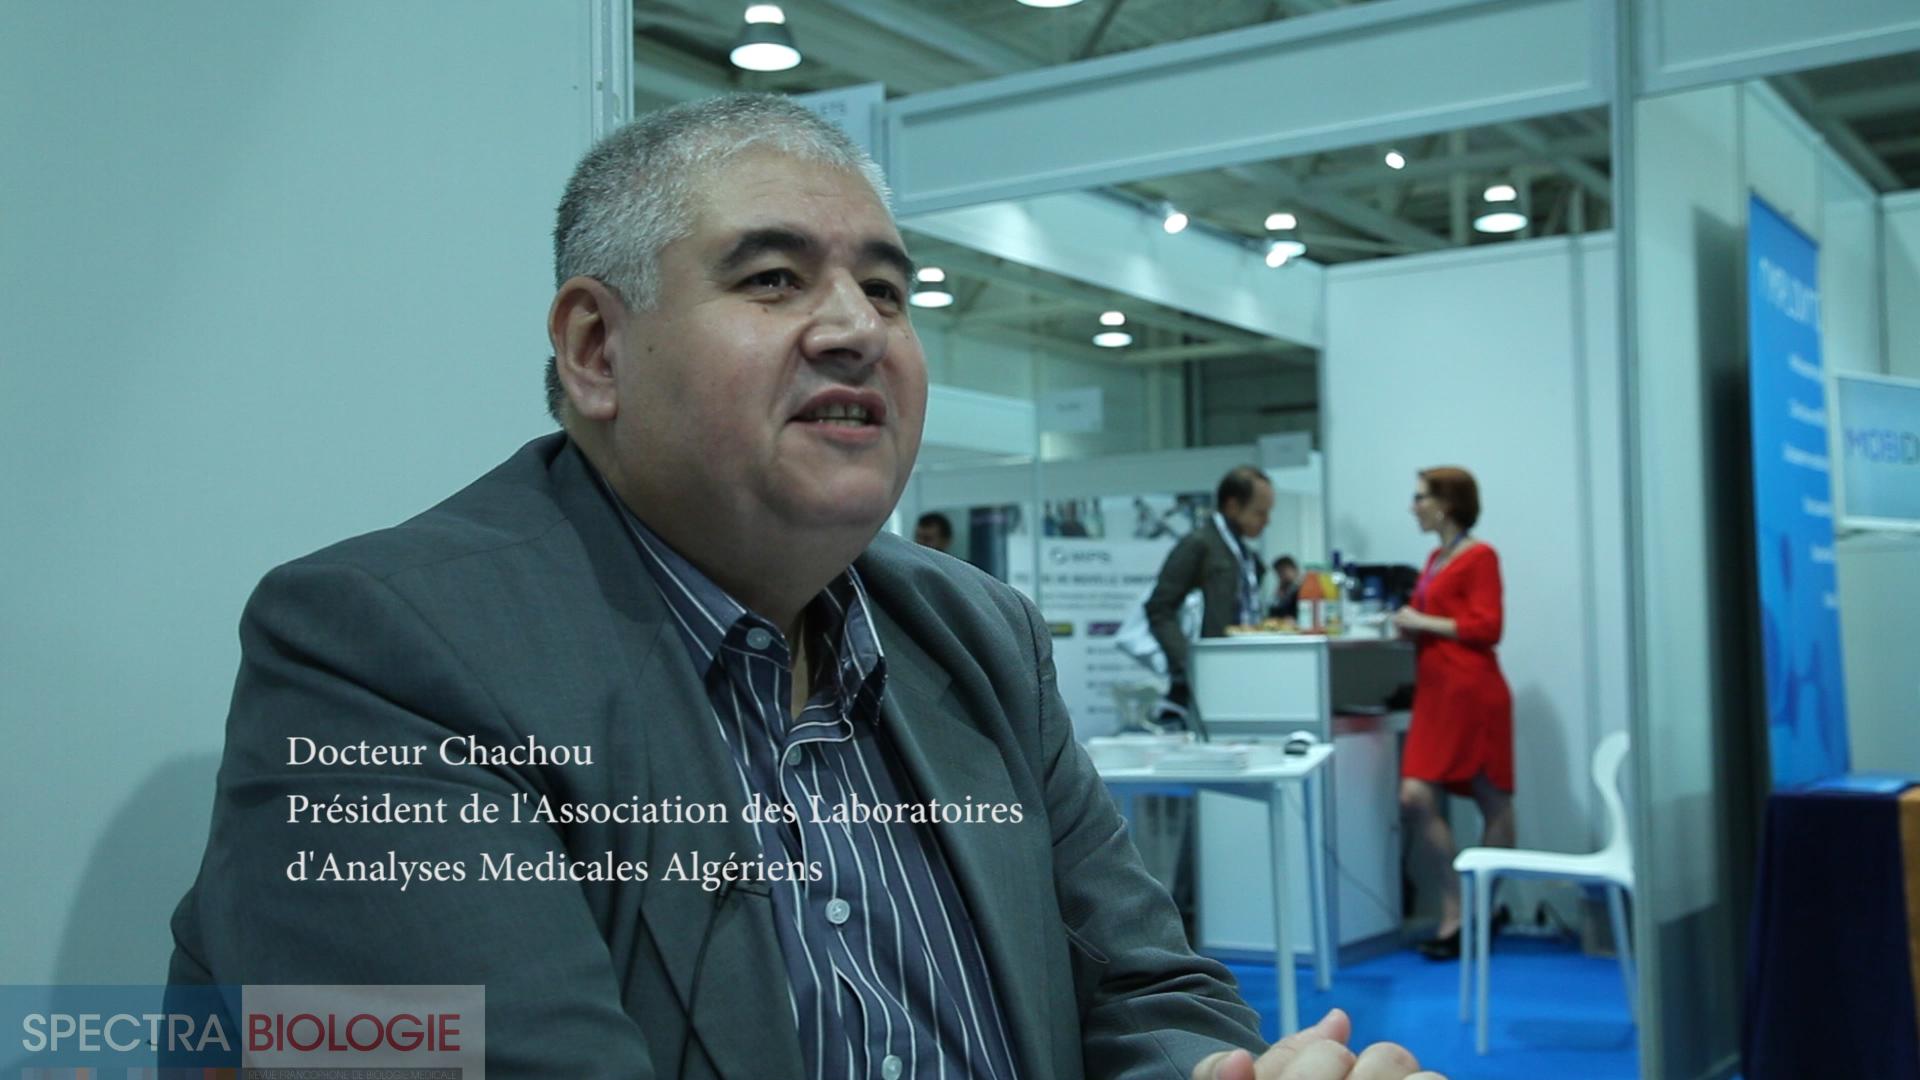 docteur-chachou-JFBM